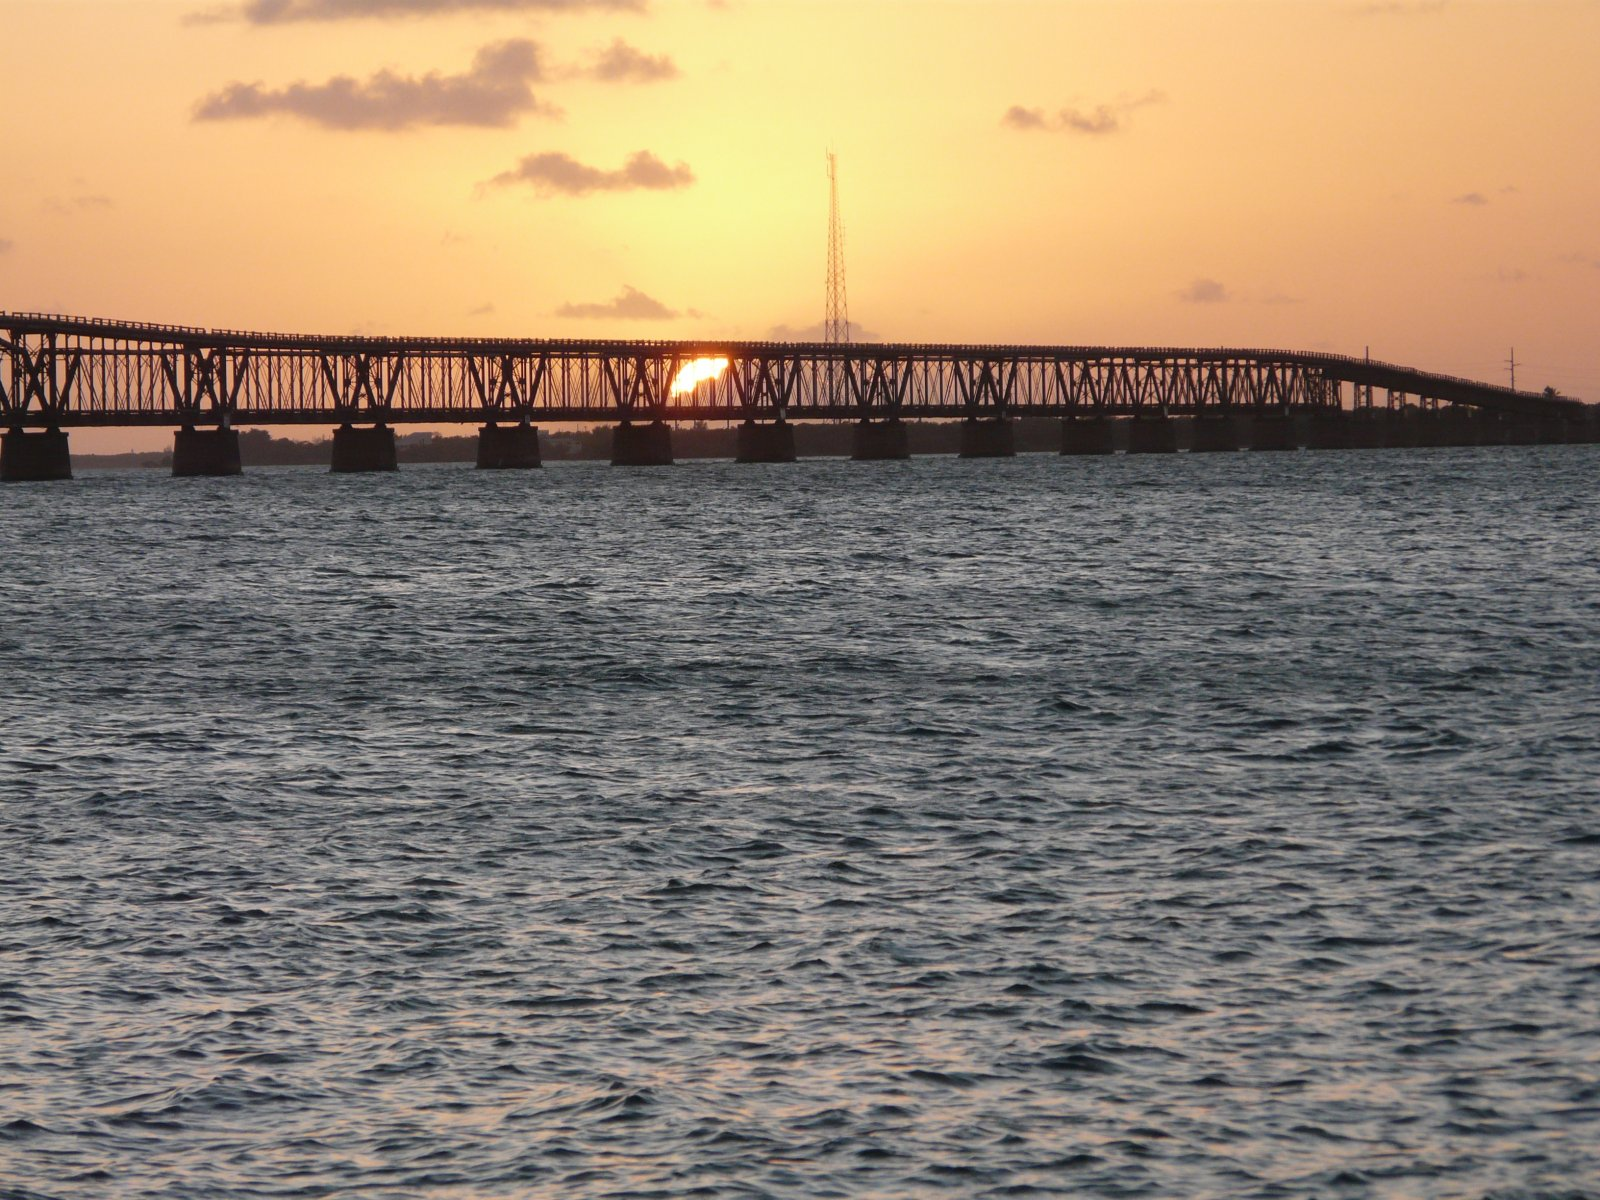 Click image for larger version  Name:BAHIA HONDA - FLA KEYS   NOV 09, 2011 11-2-2011 6-31-39 PM.jpg Views:124 Size:379.3 KB ID:36754